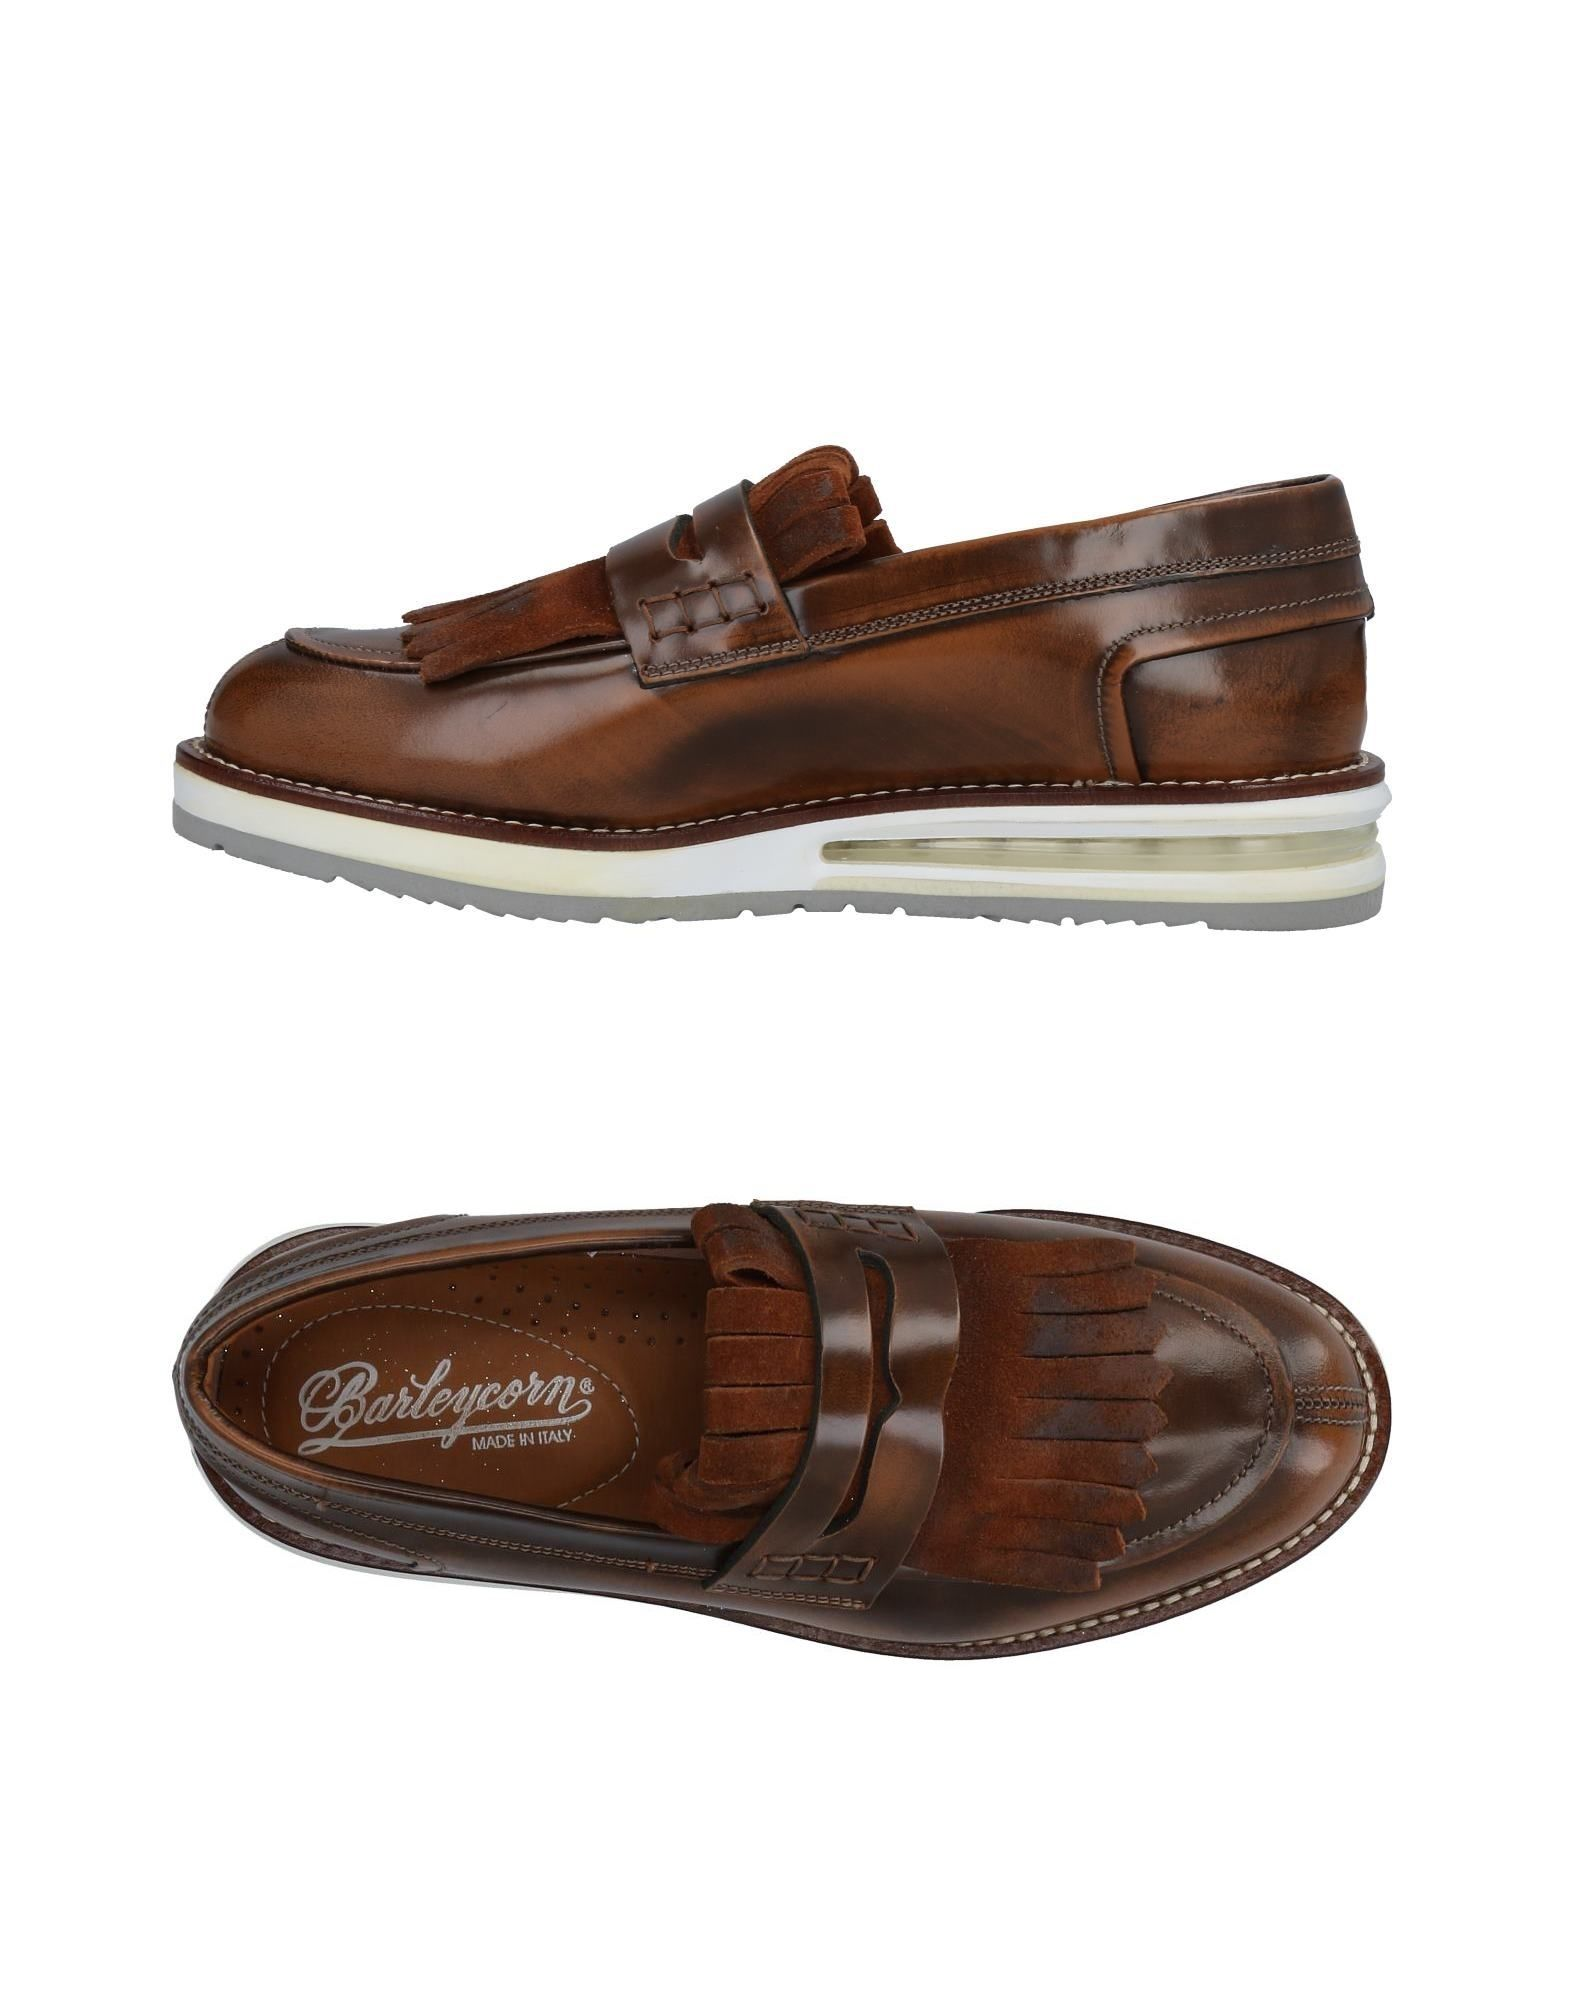 Barleycorn Mokassins Damen  beliebte 11479304UB Gute Qualität beliebte  Schuhe 7fa336